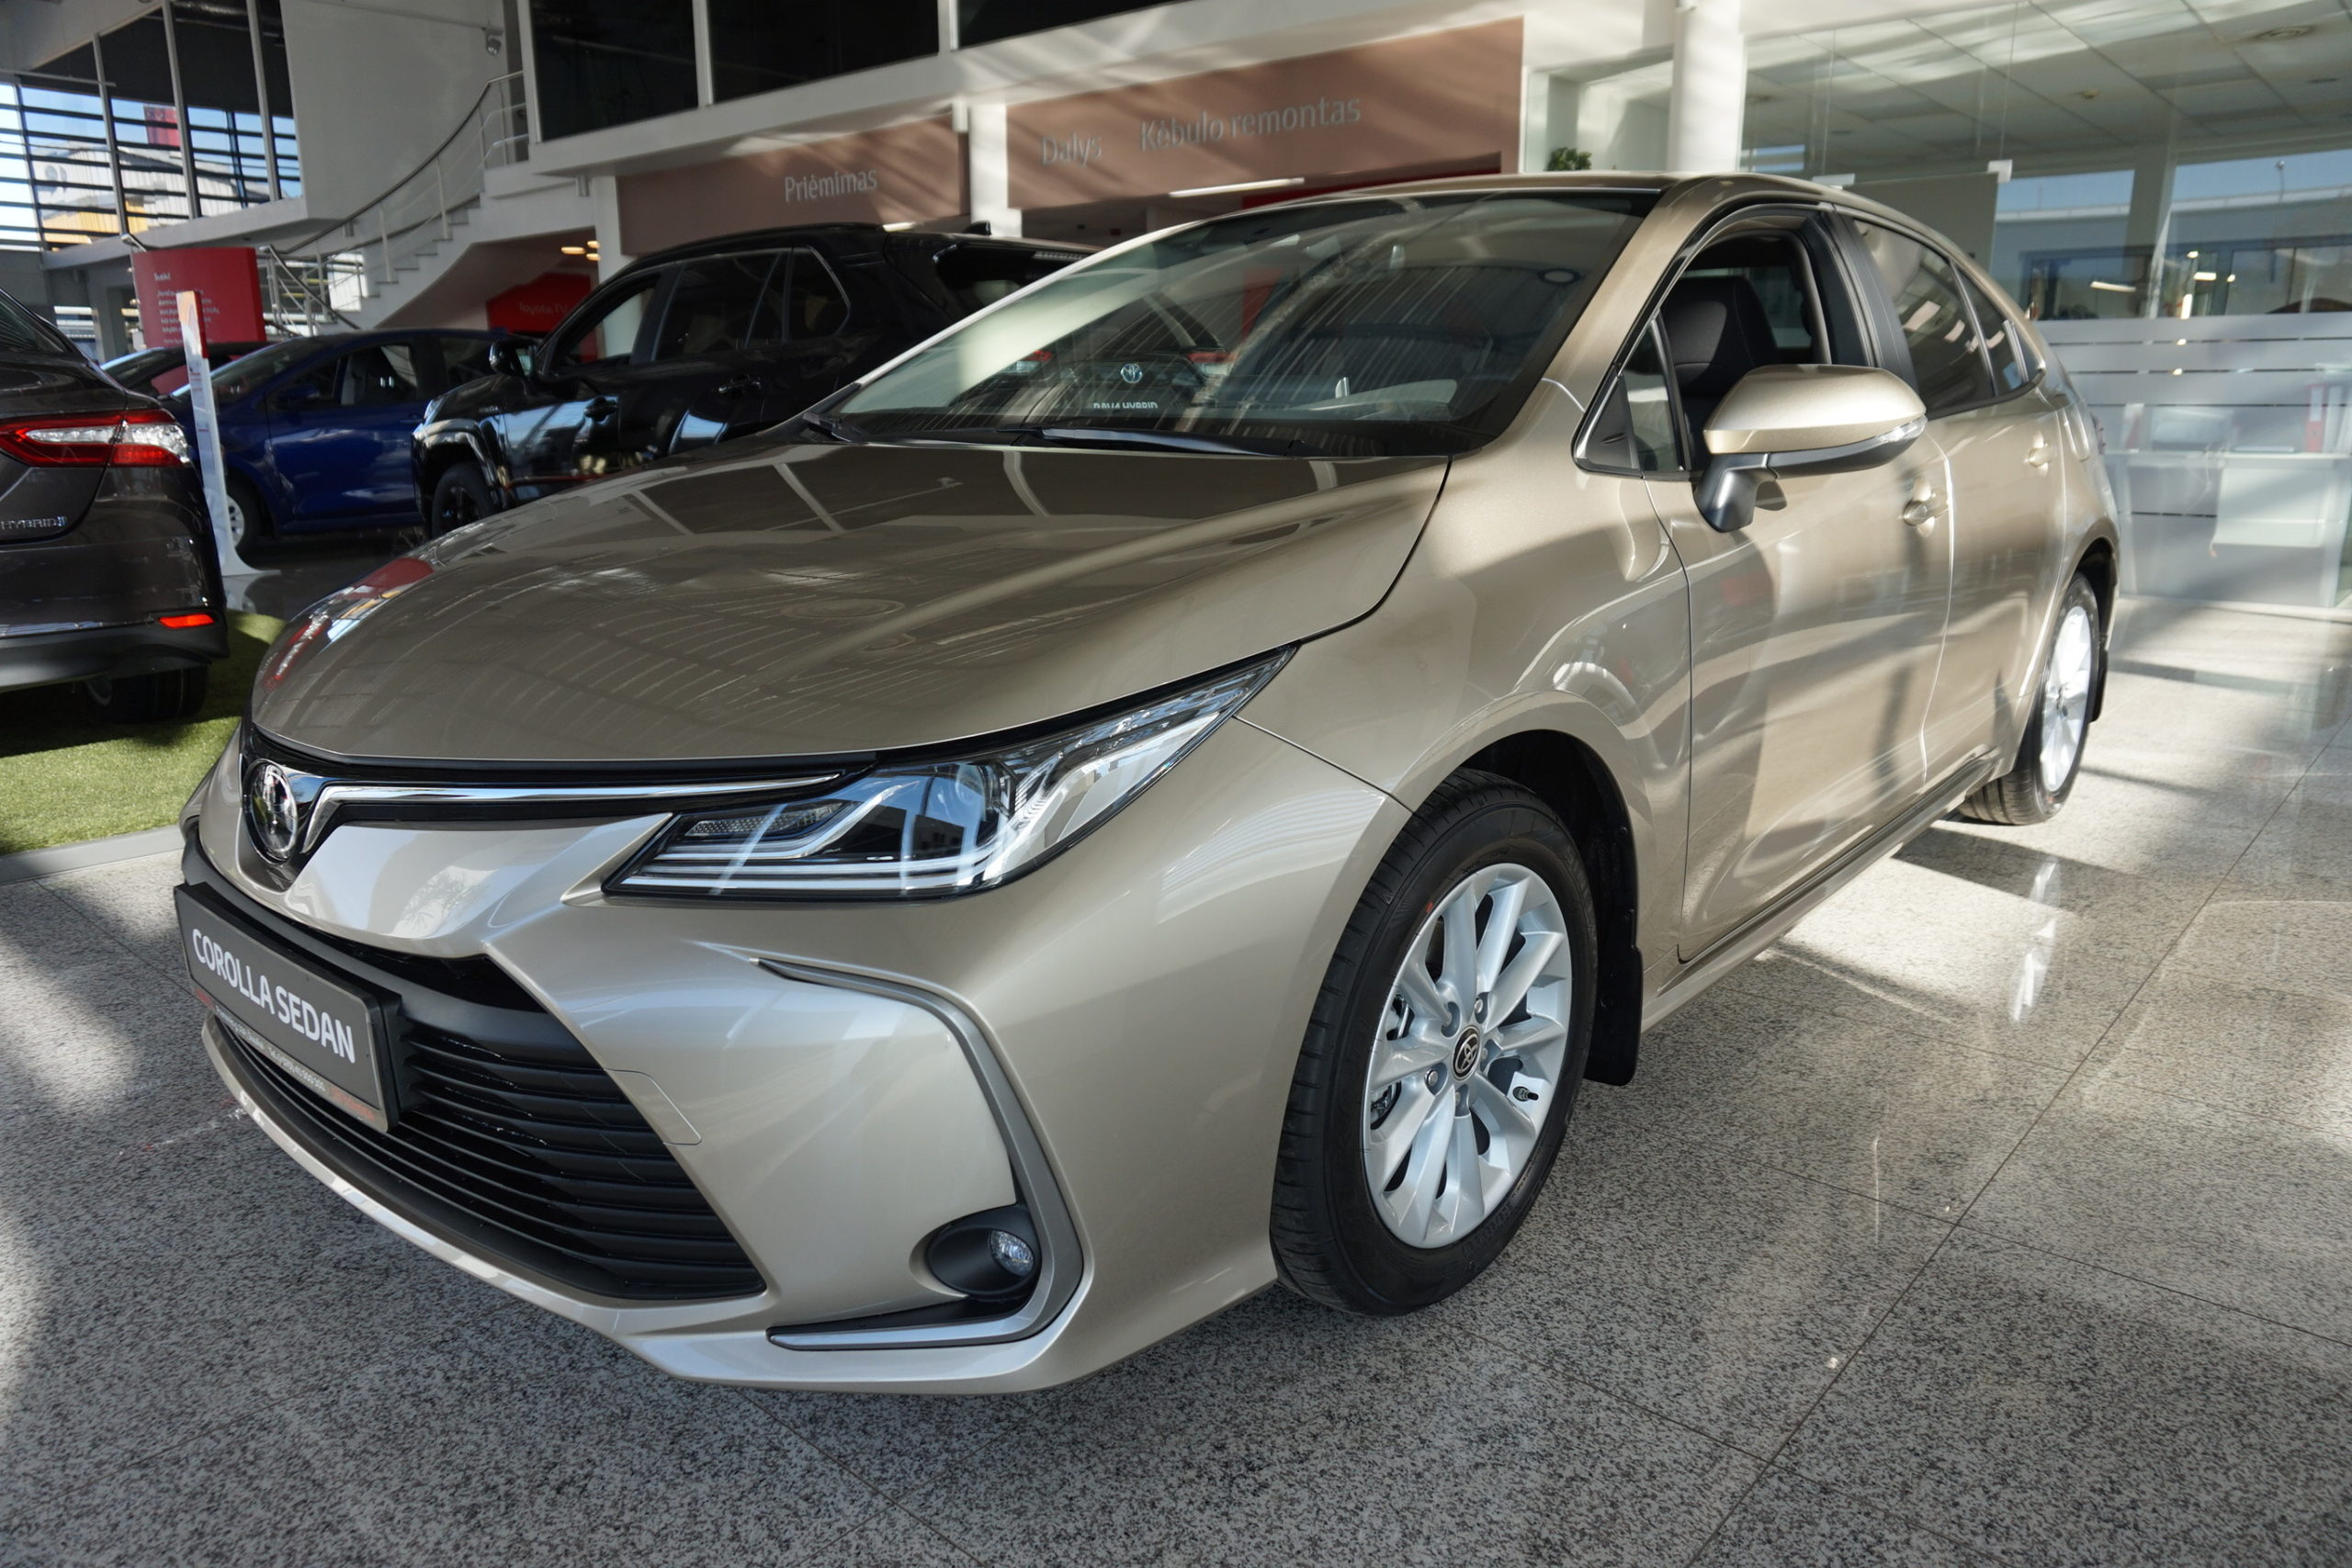 Corolla Sedan 1.5 Dynamic Force Active Plus Multidrive S Image